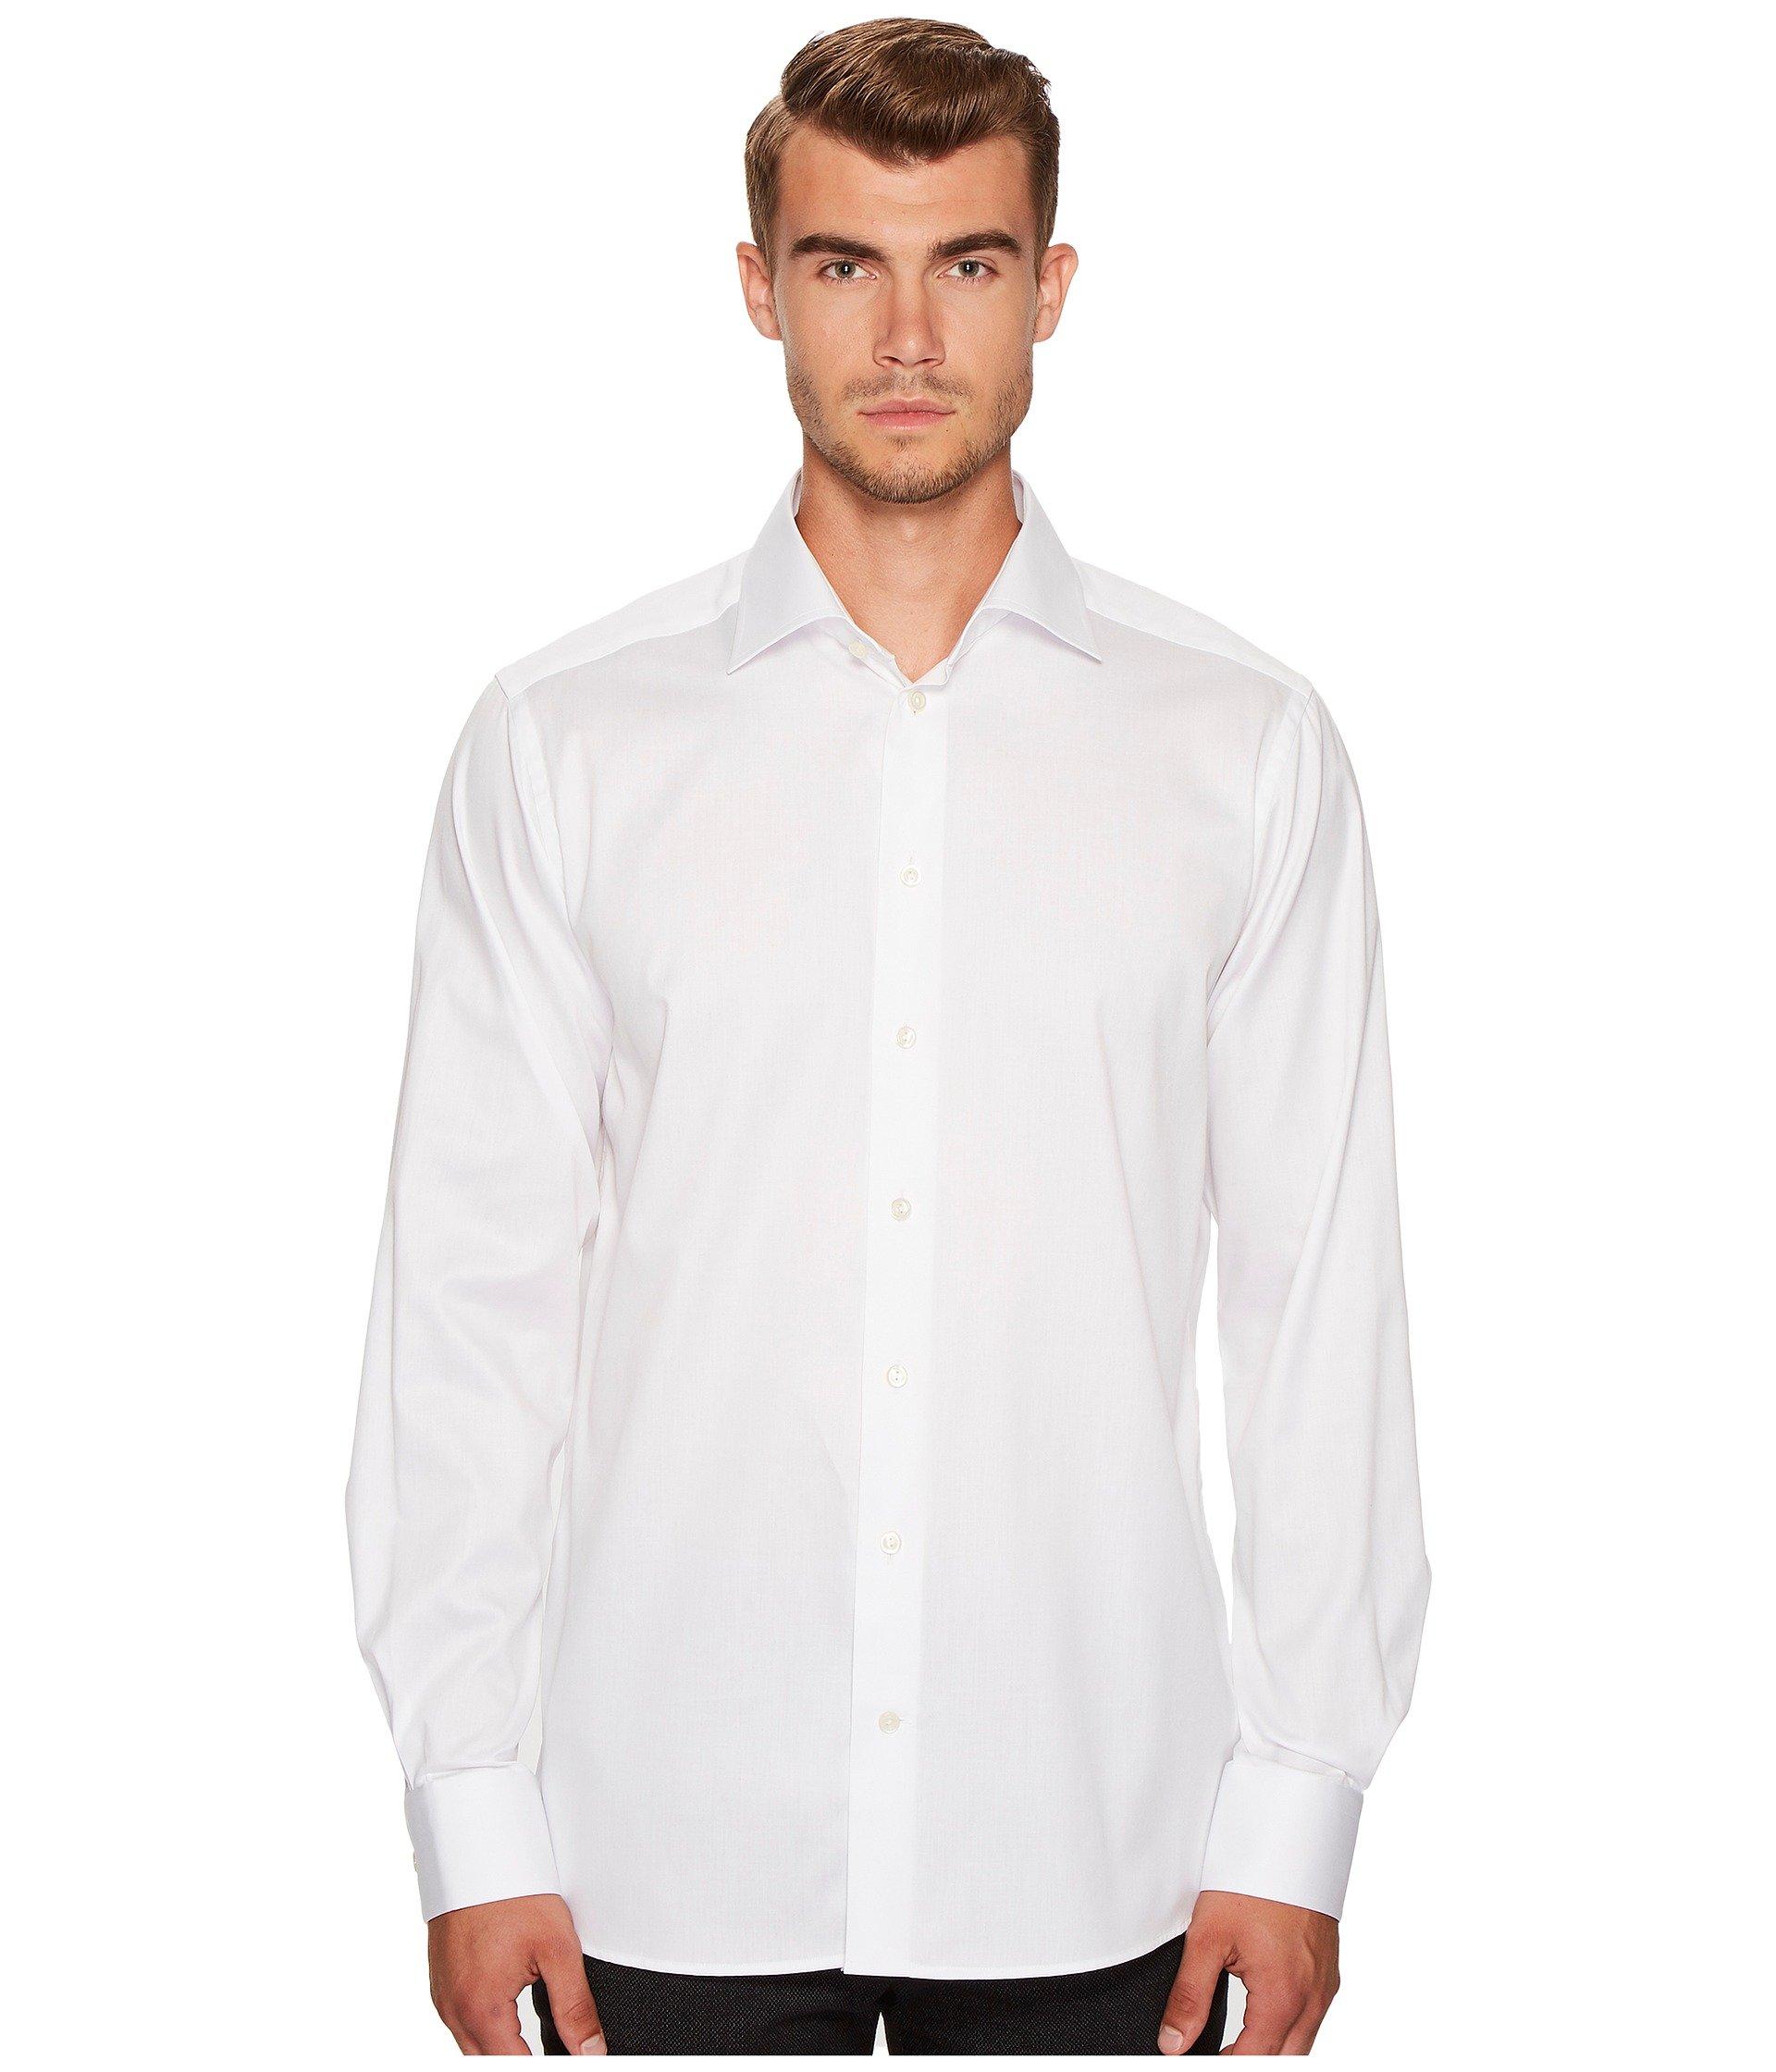 Signature Shirt Twill Eton White Contemporary Fit xgZwAR